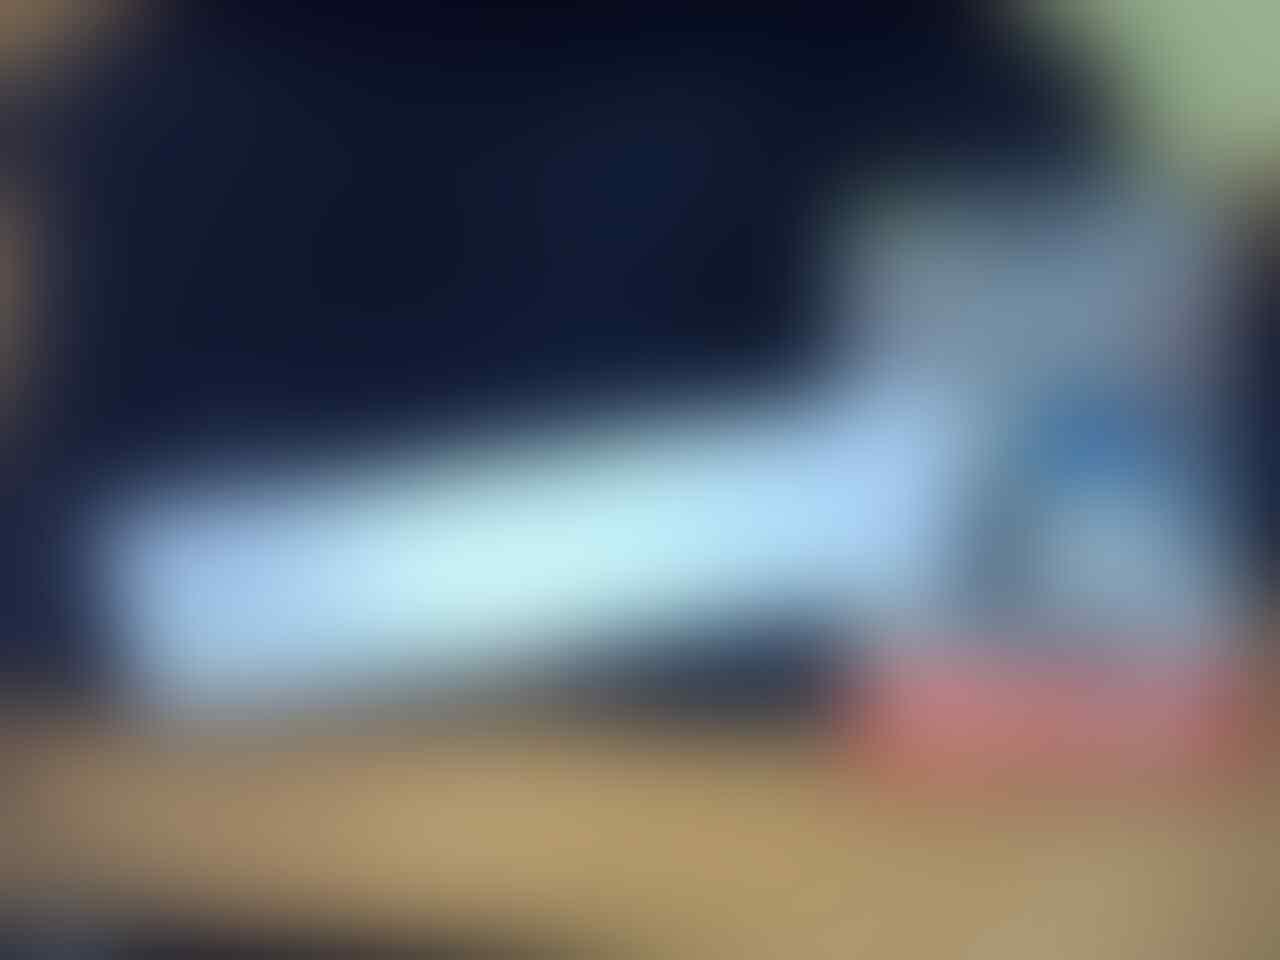 micro sd card kingston ultra sandisk toshiba samsung flashdisk fit sony 8gb 16gb 32gb